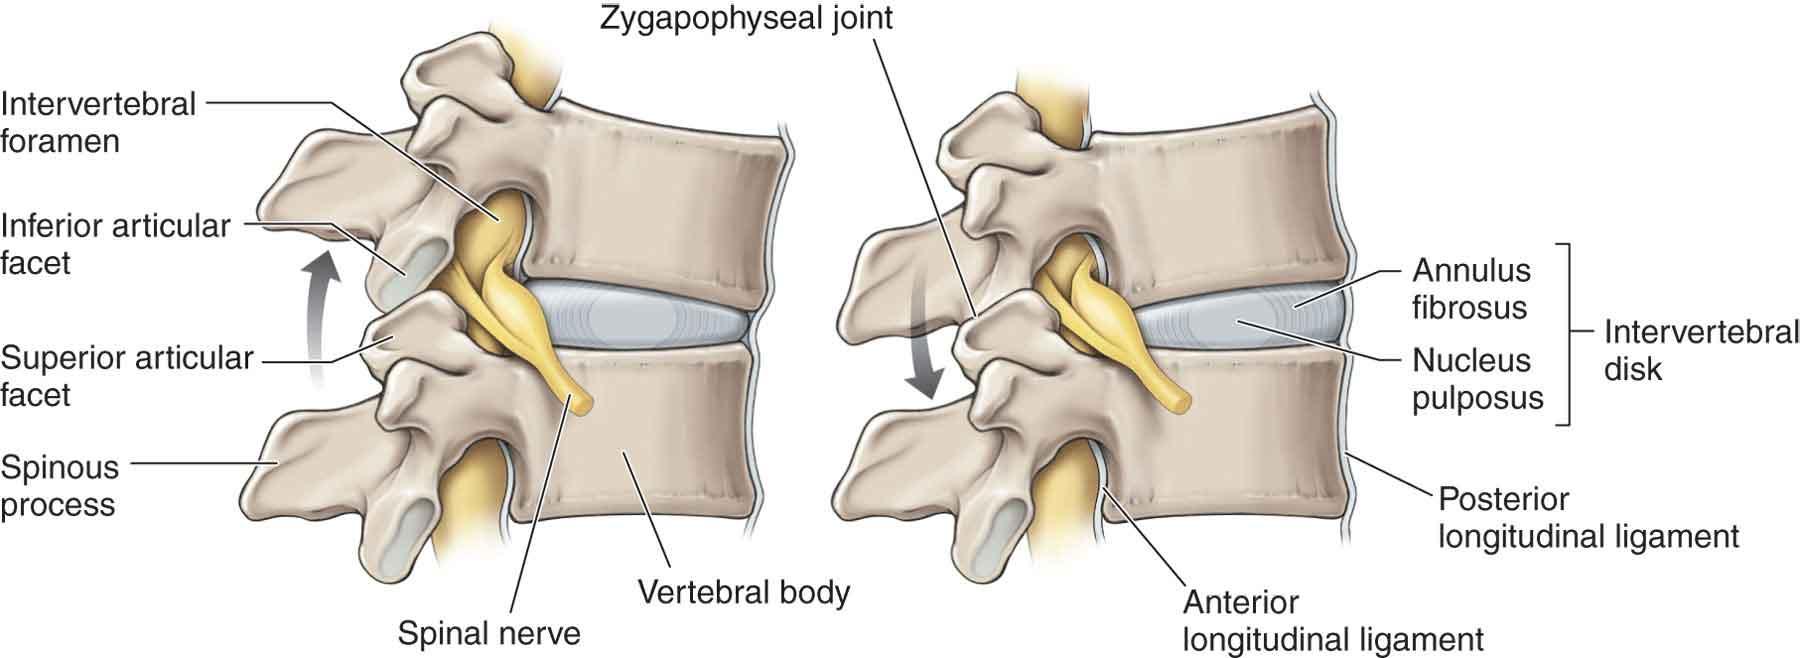 Vertebral Column | Musculoskeletal Key